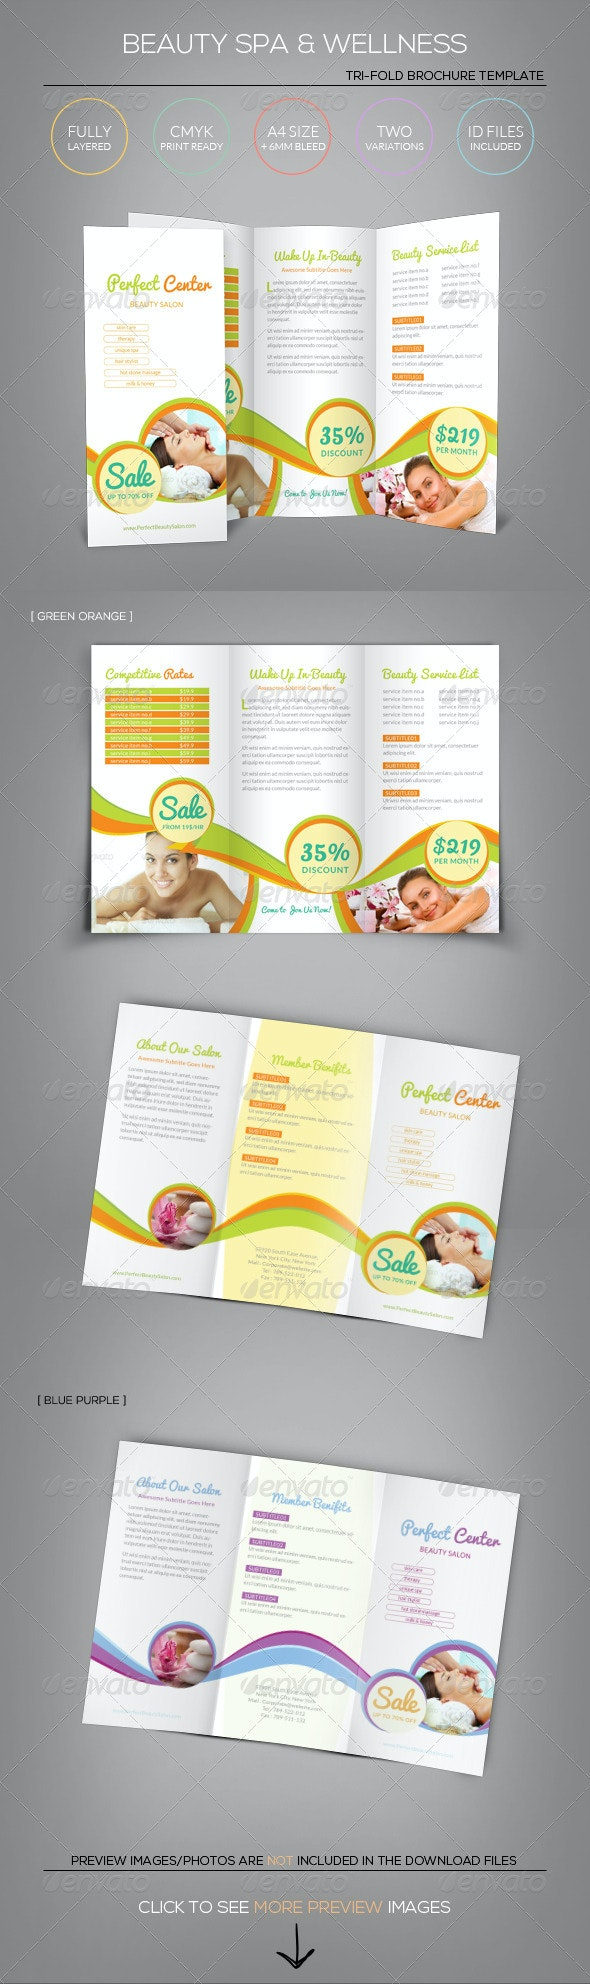 Beauty Spa & Wellness - Tri-Fold Brochure Template - Corporate Brochures